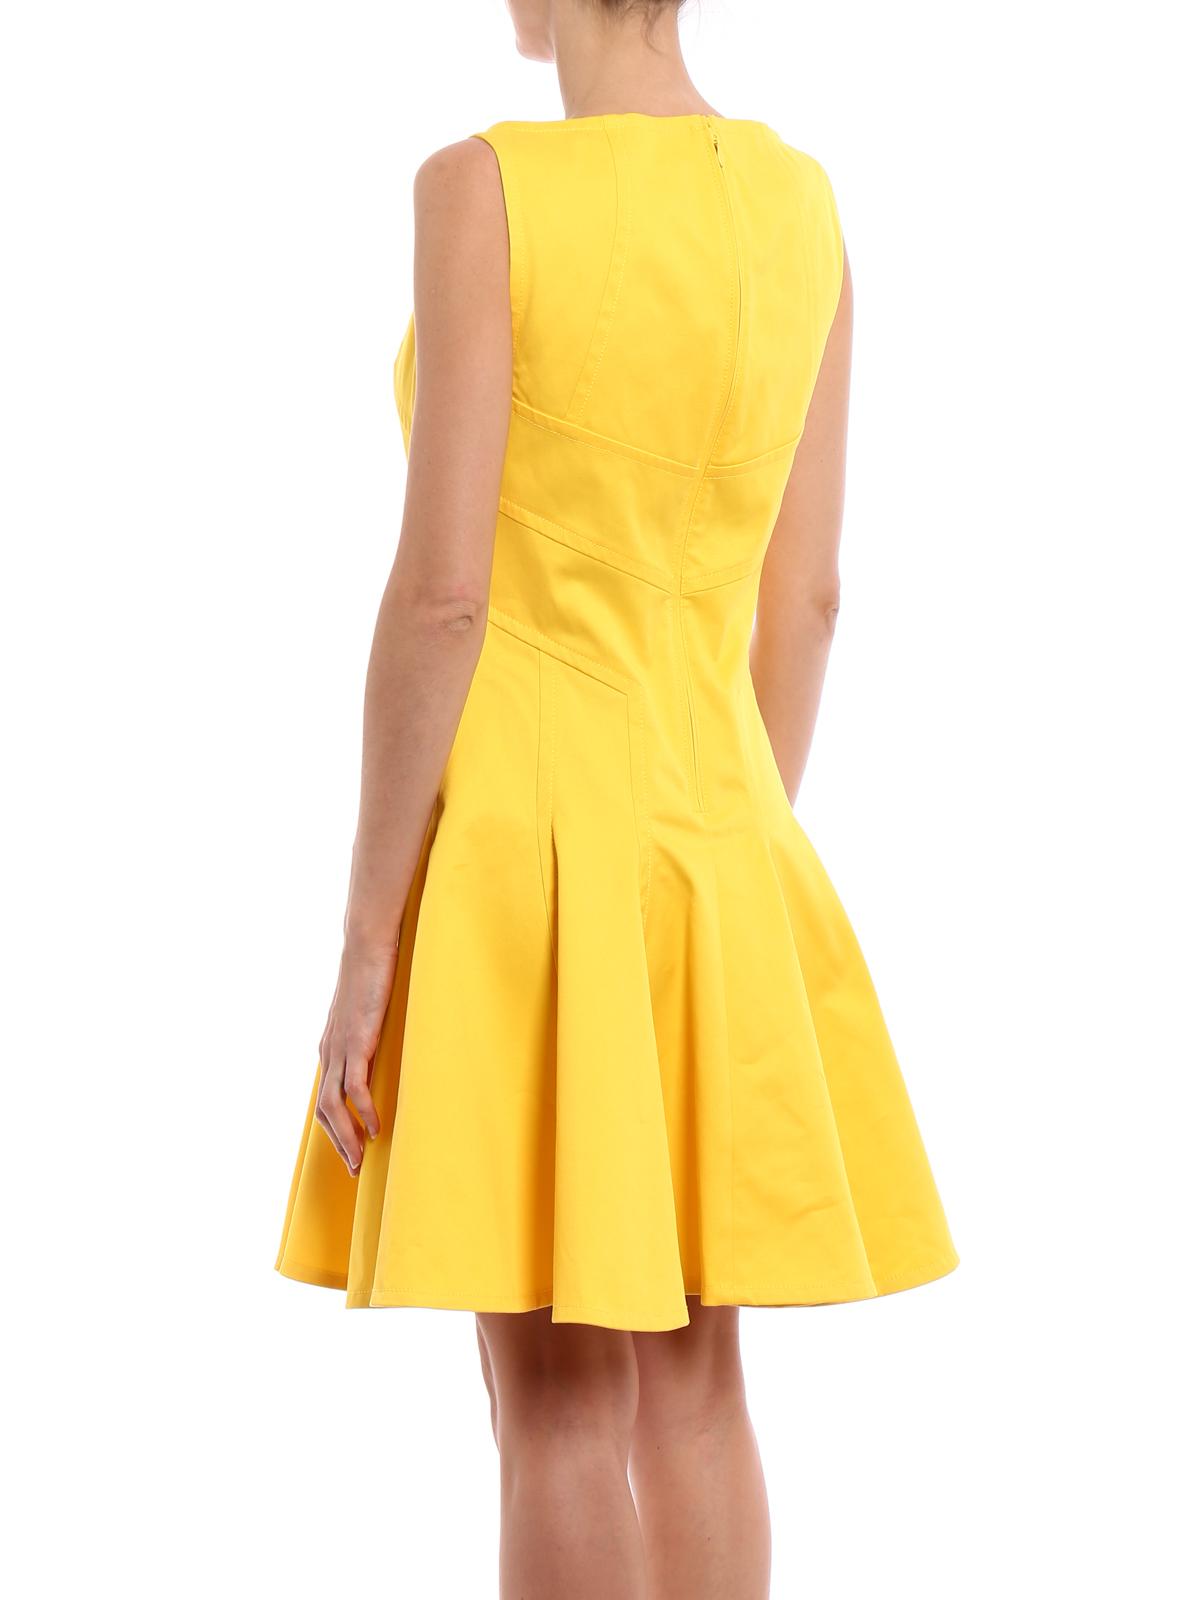 dsquared2 - knielanges kleid - gelb - knielange kleider